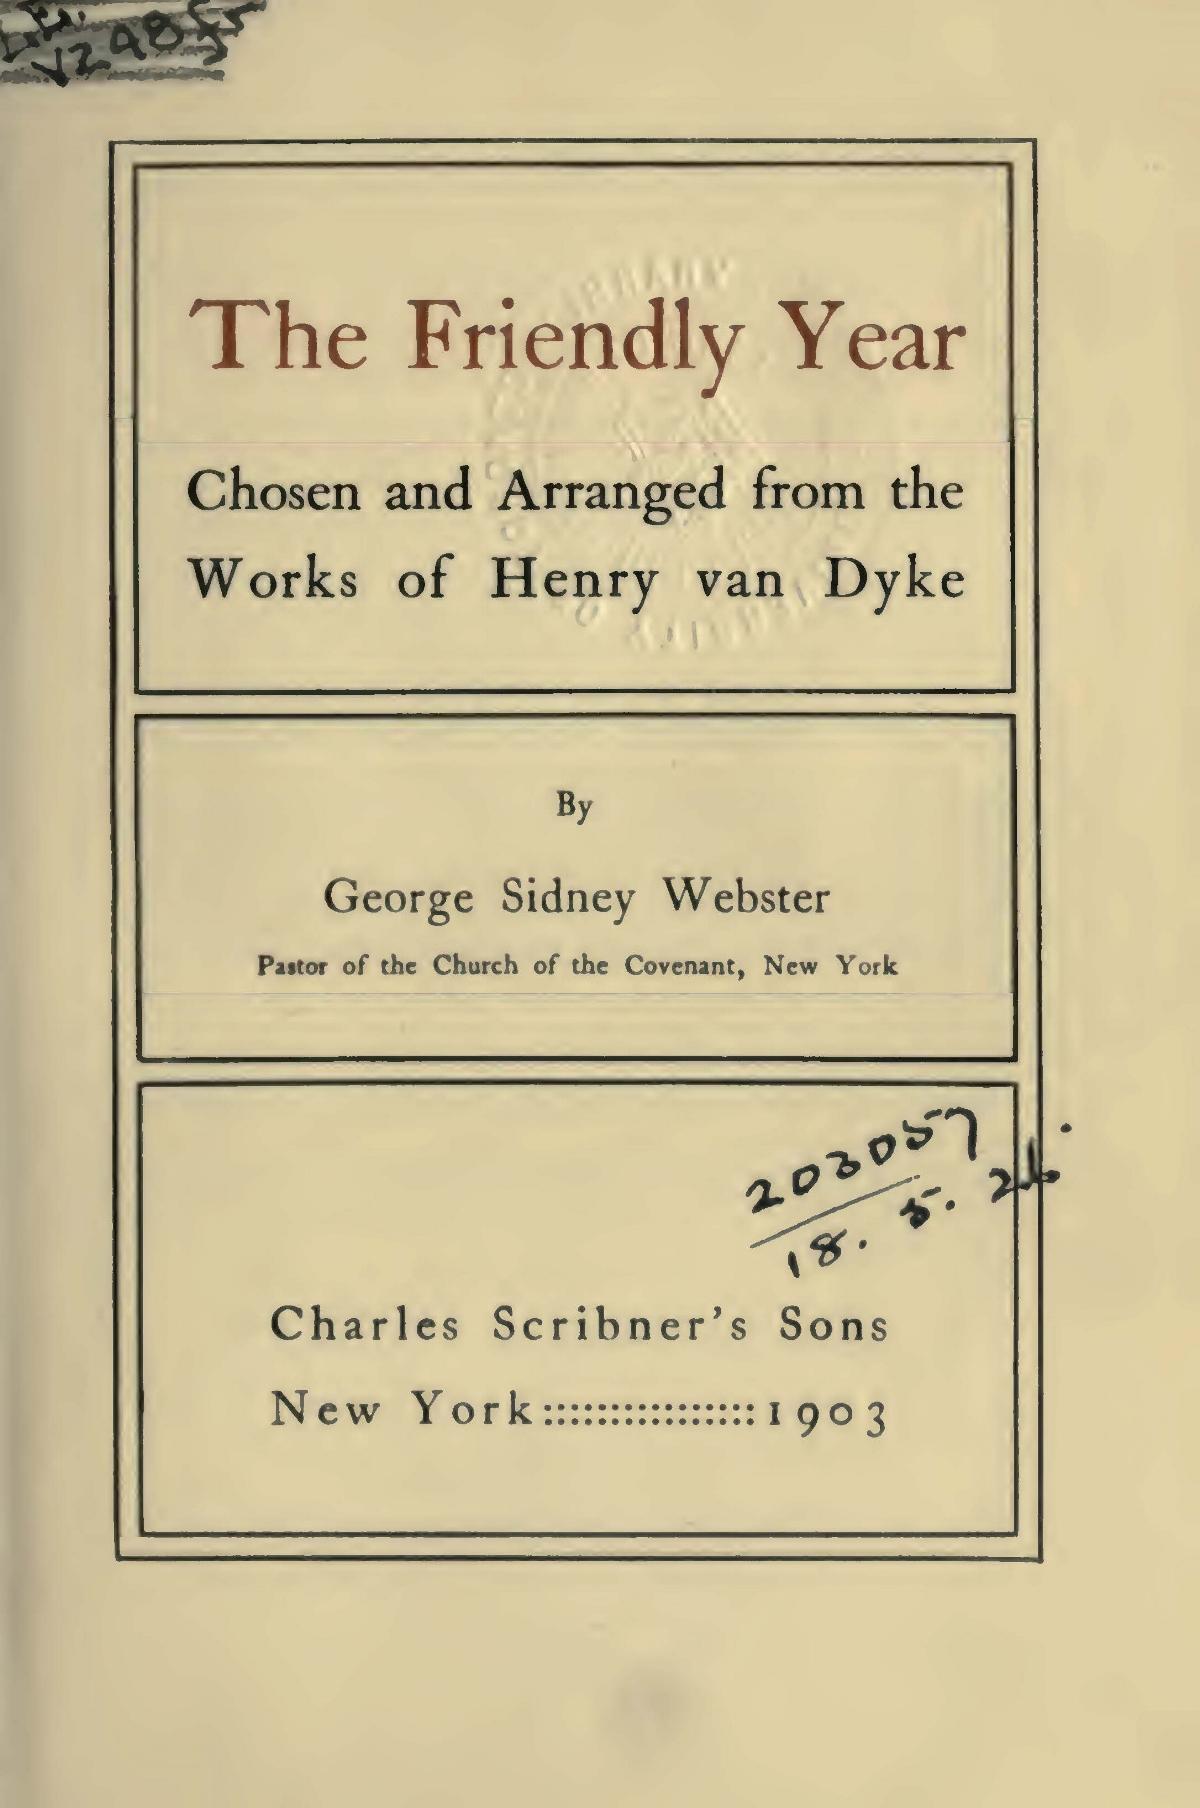 Van Dyke, Jr., Henry Jackson, The Friendly Year Title Page.jpg